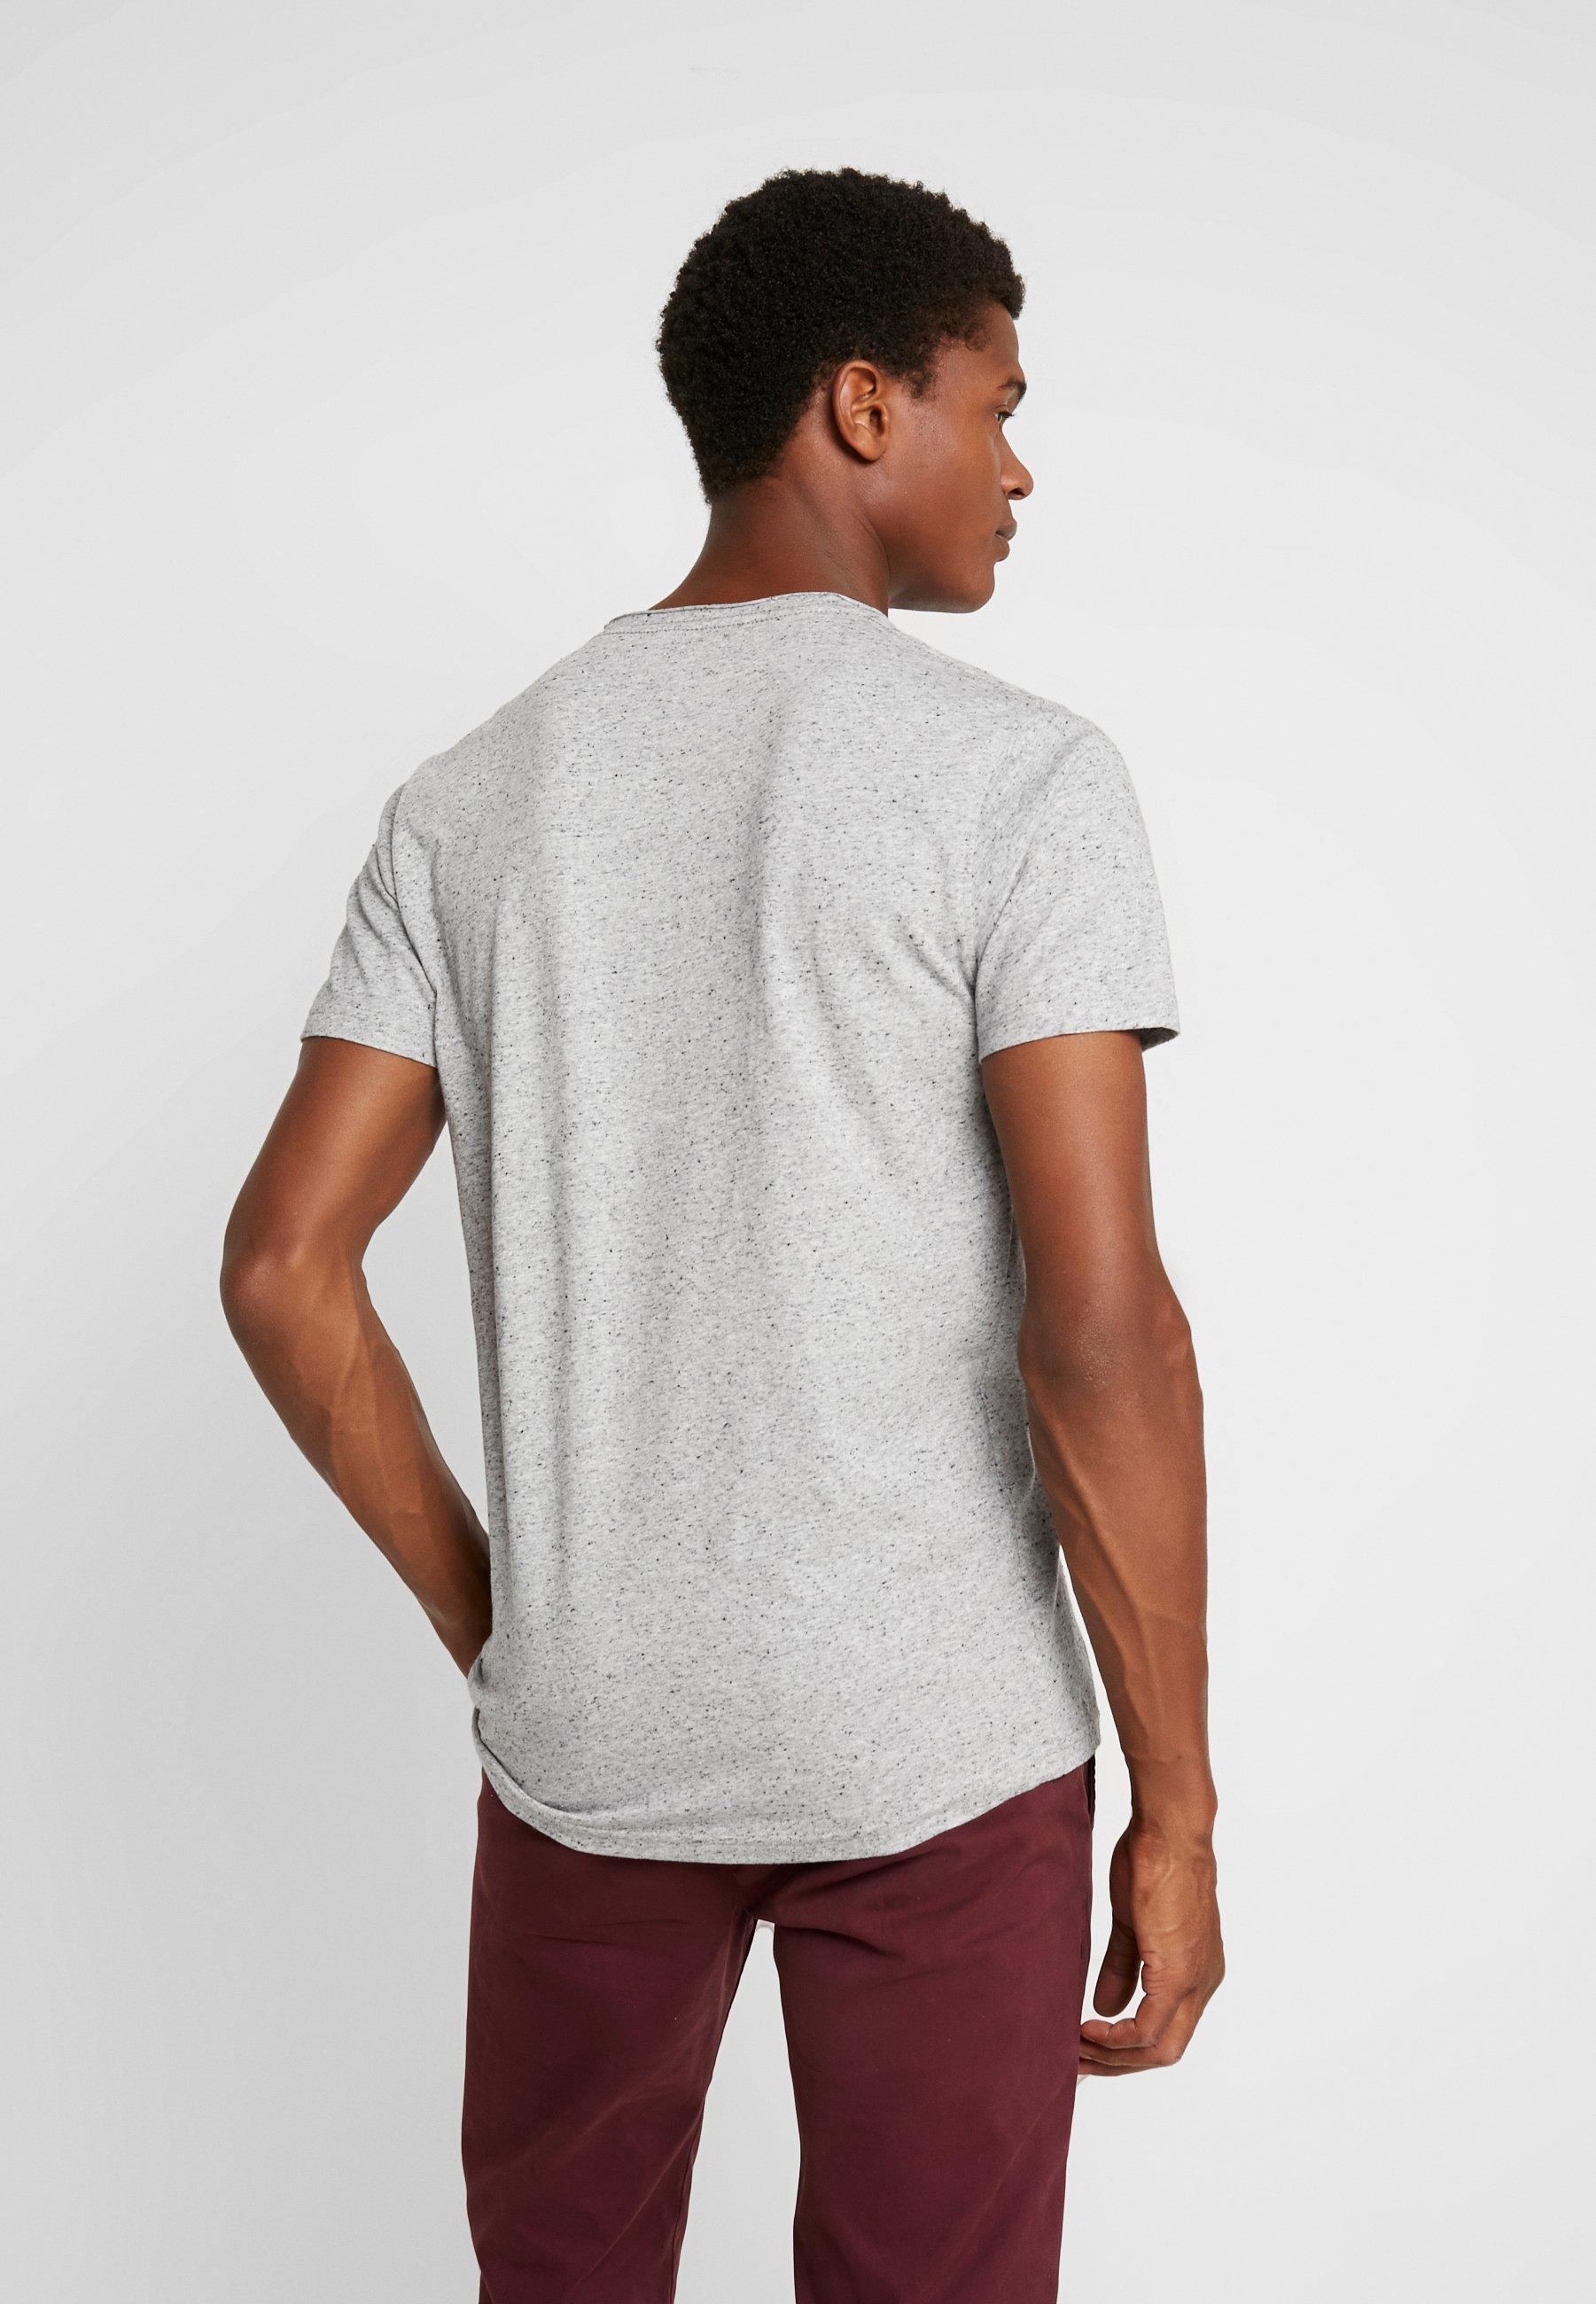 print TEET Shirt grey mix HAND Original EMBROIDERY Shine nwk08XOP